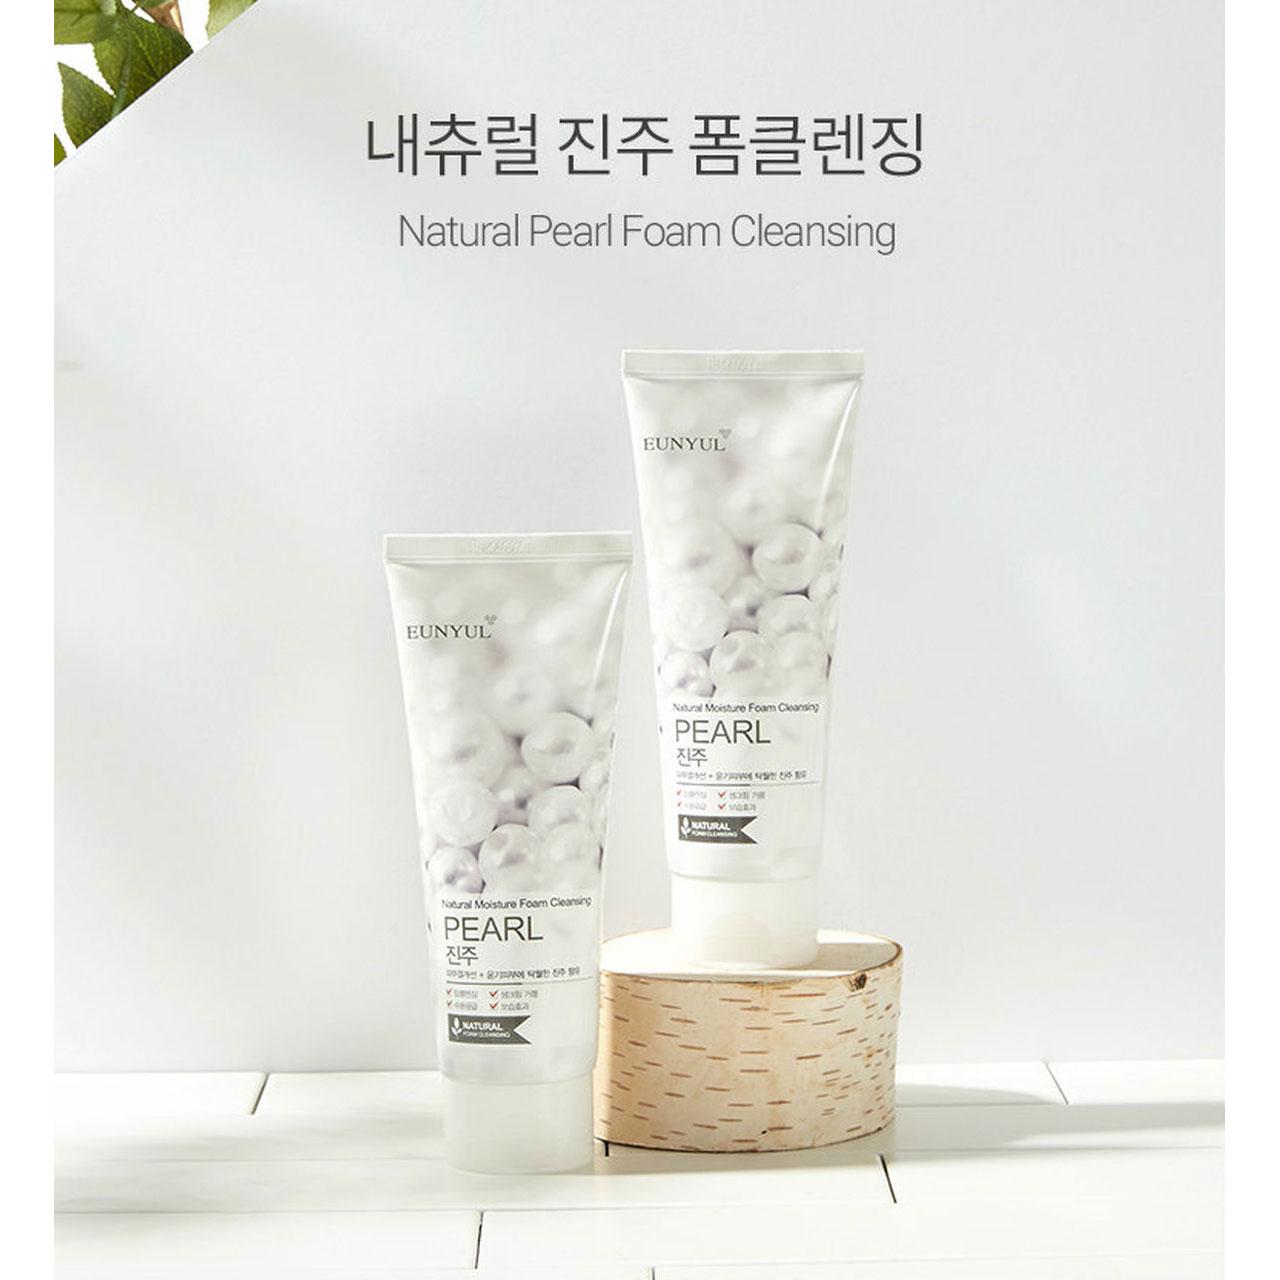 EUNYUL Pearl Foam Cleansing